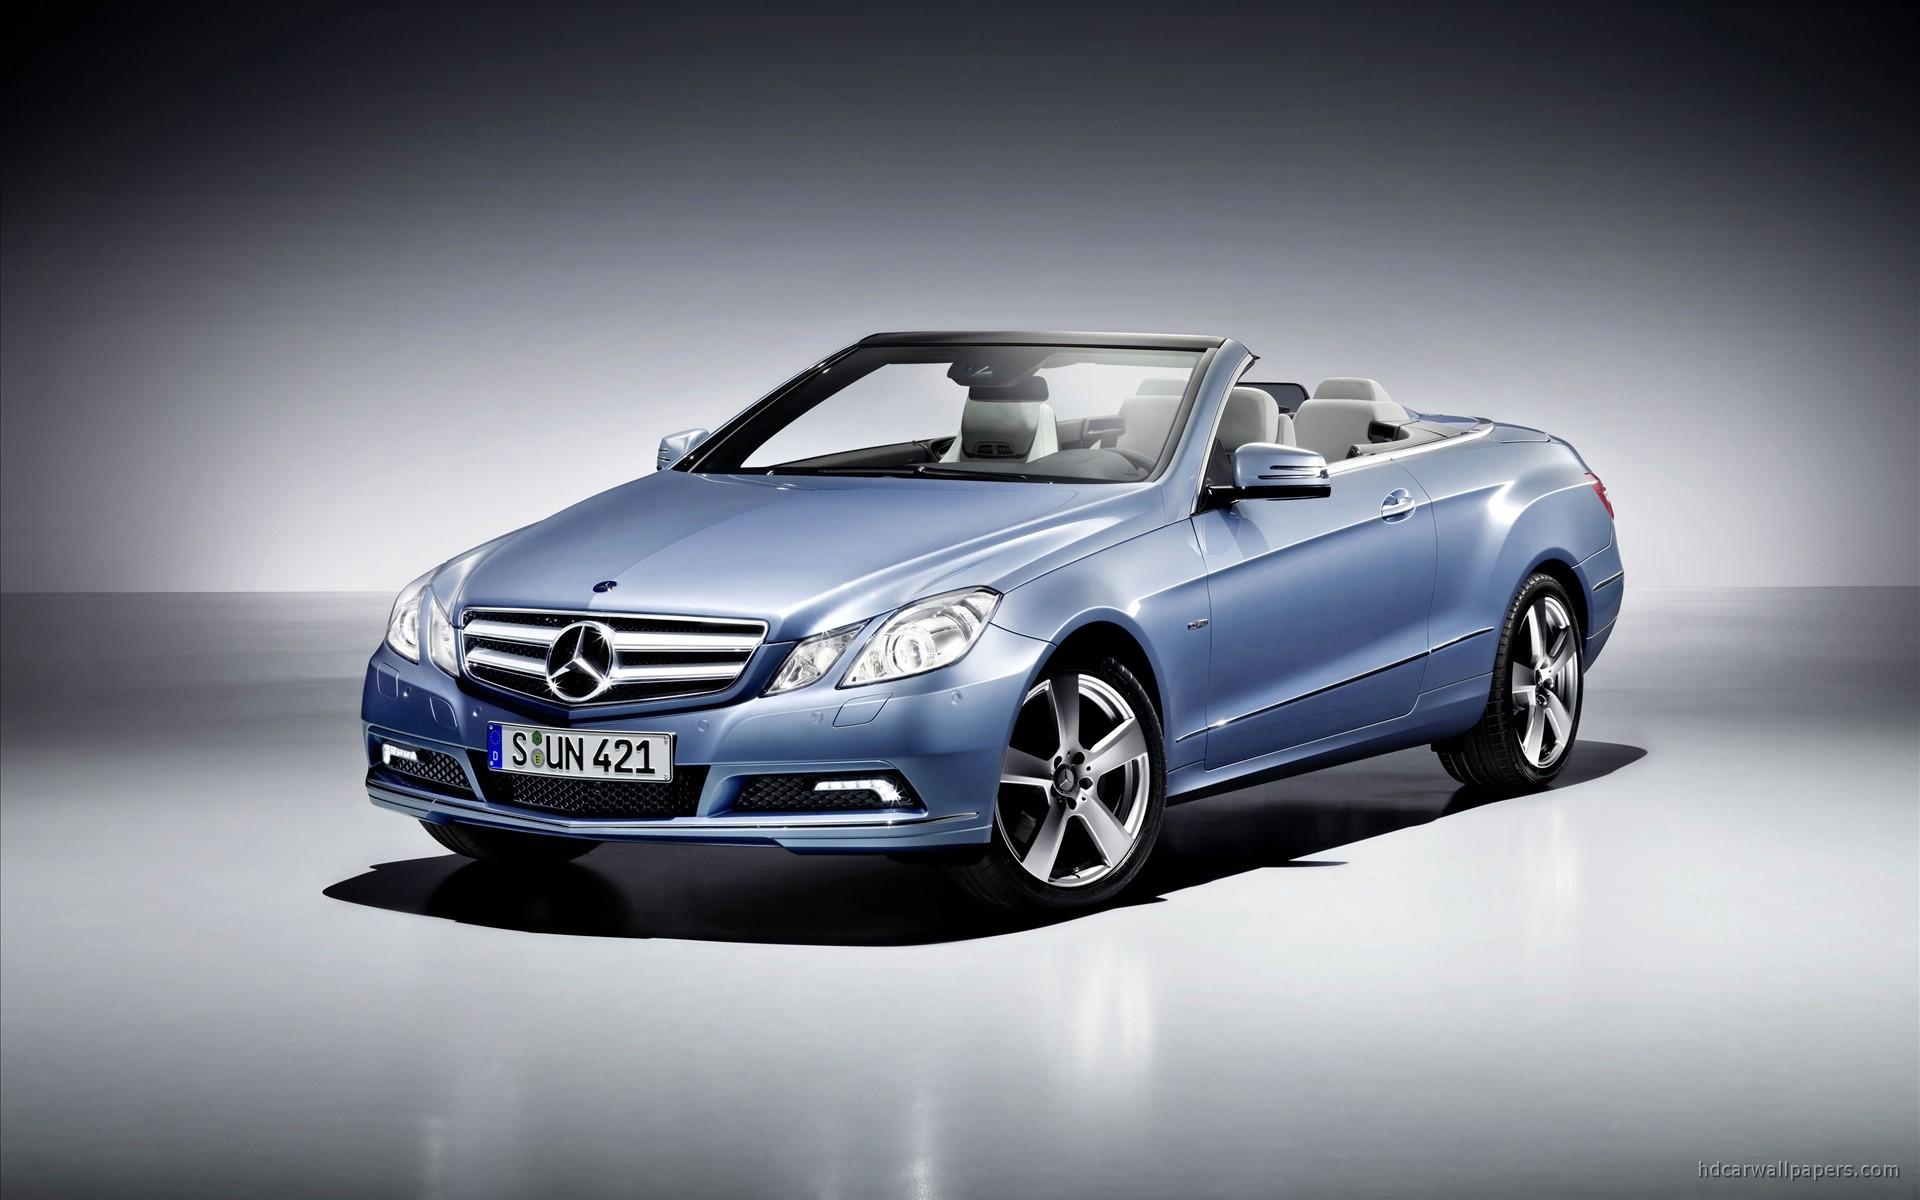 2011 mercedes benz e class cabriolet 2 wallpaper hd car for Mercedes benz e class 2011